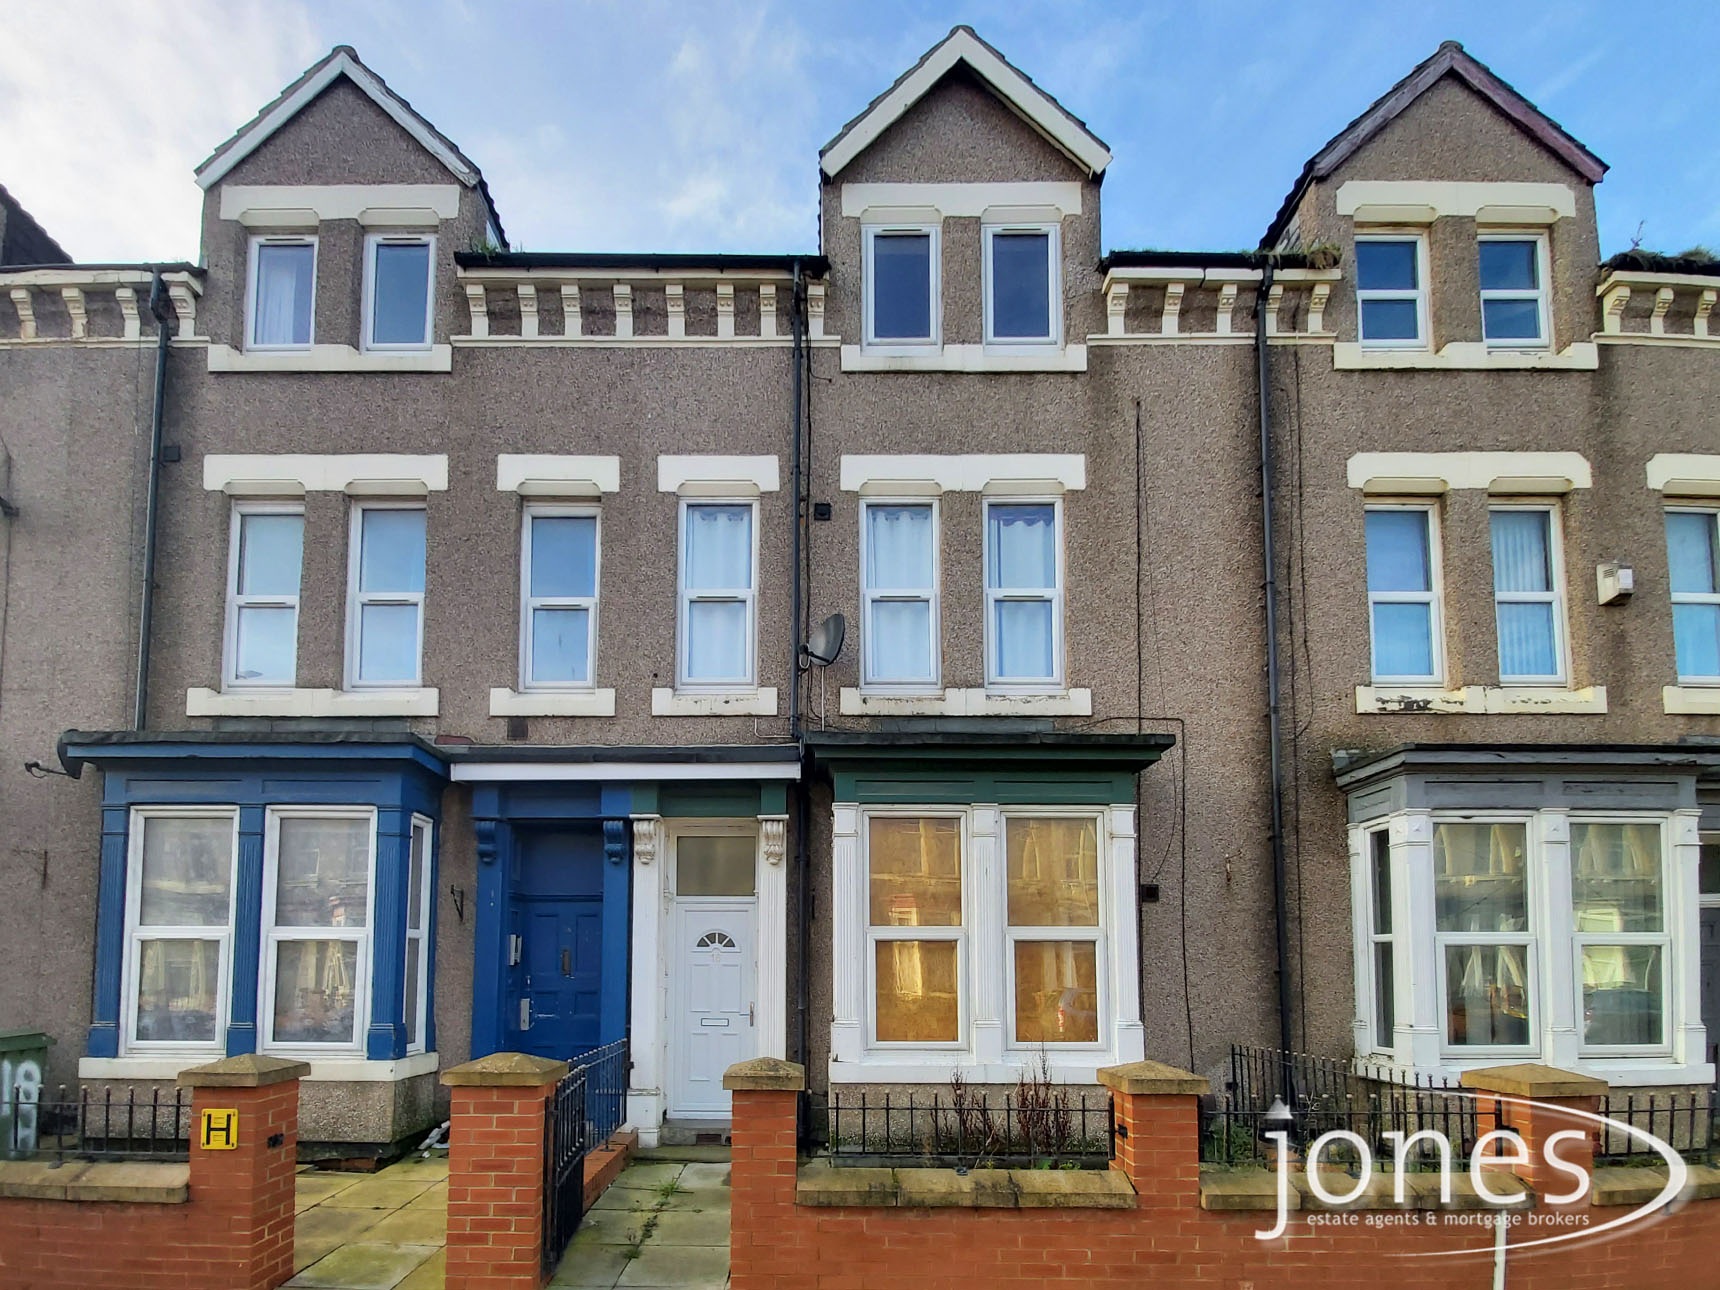 Home for Sale Let - Photo 01 Hartington Road, ,Stockton on Tees,TS18 1HE